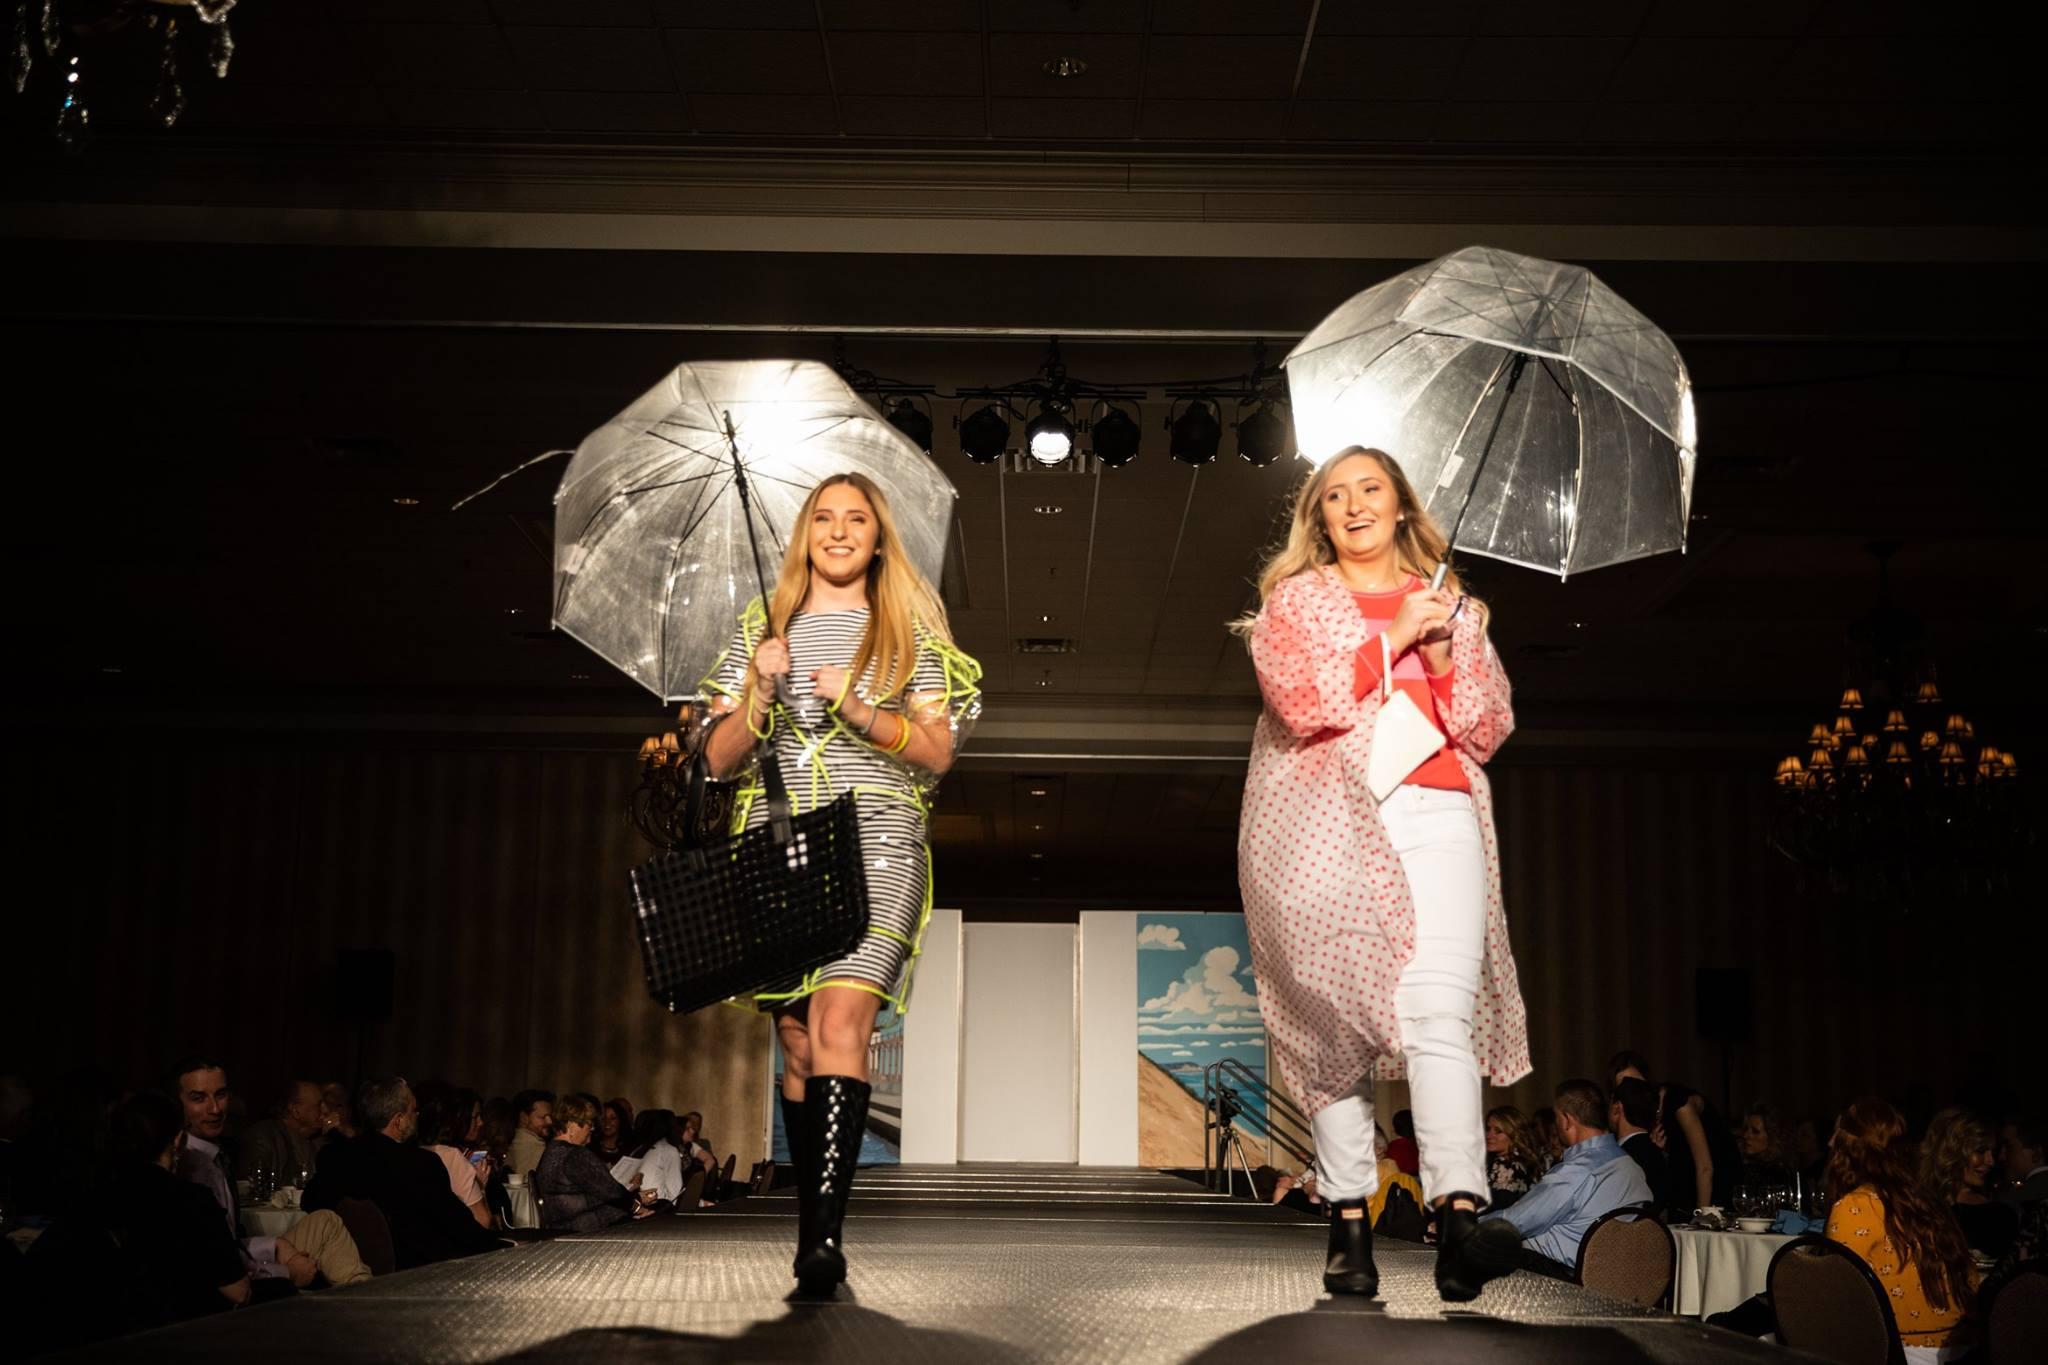 Lutheran_North_High_School_Macomb_Michigan_LHN_Fashion_Show_2019 (17).jpg